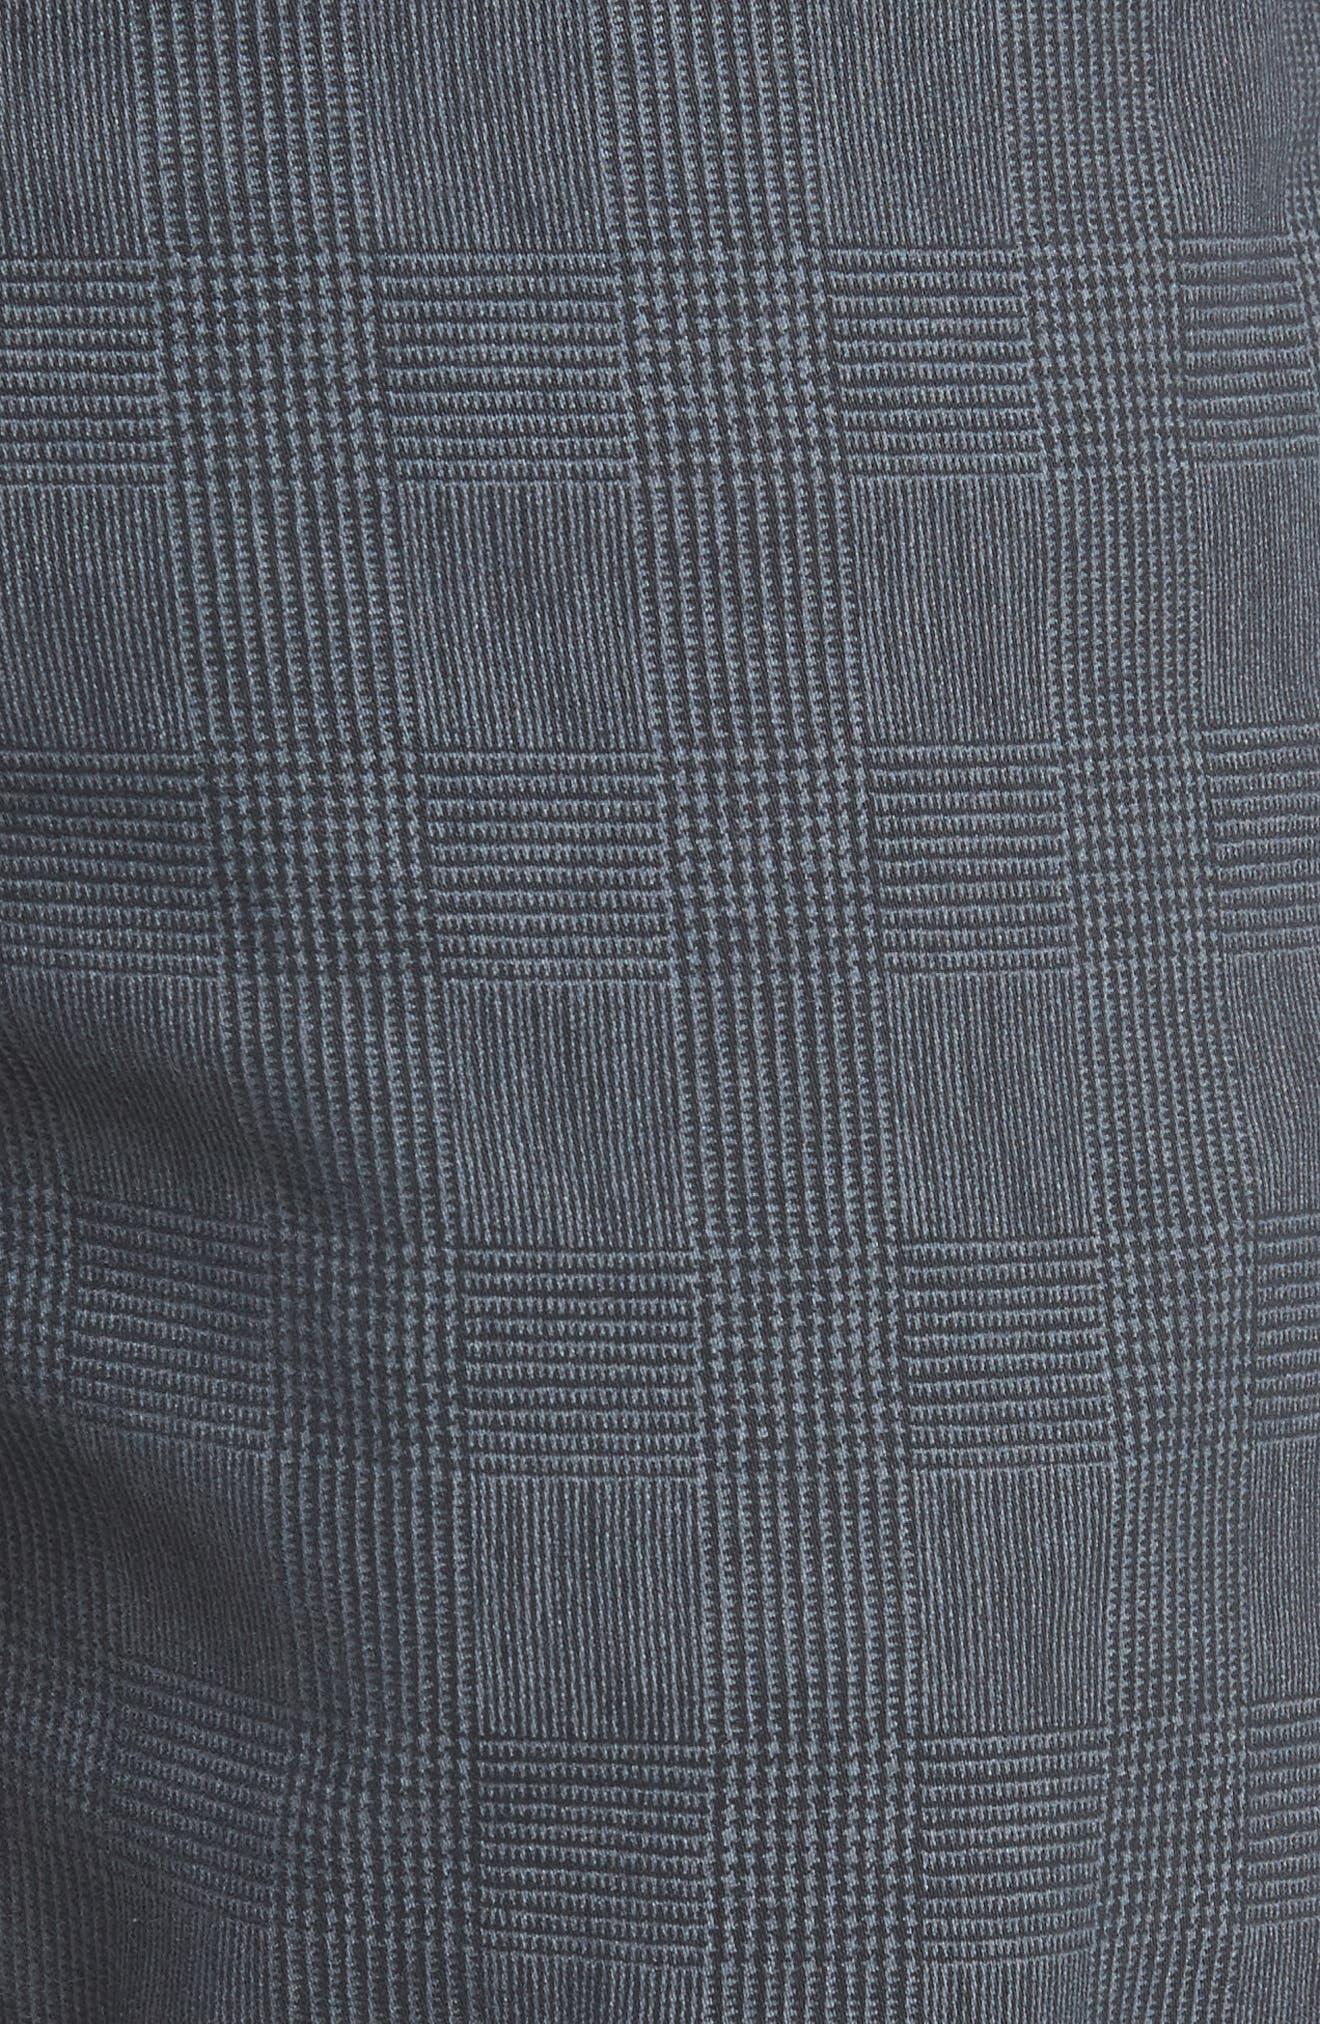 Everett SUD Print Slim Straight Leg Pants,                             Alternate thumbnail 5, color,                             FINE PLAID GREY STONE